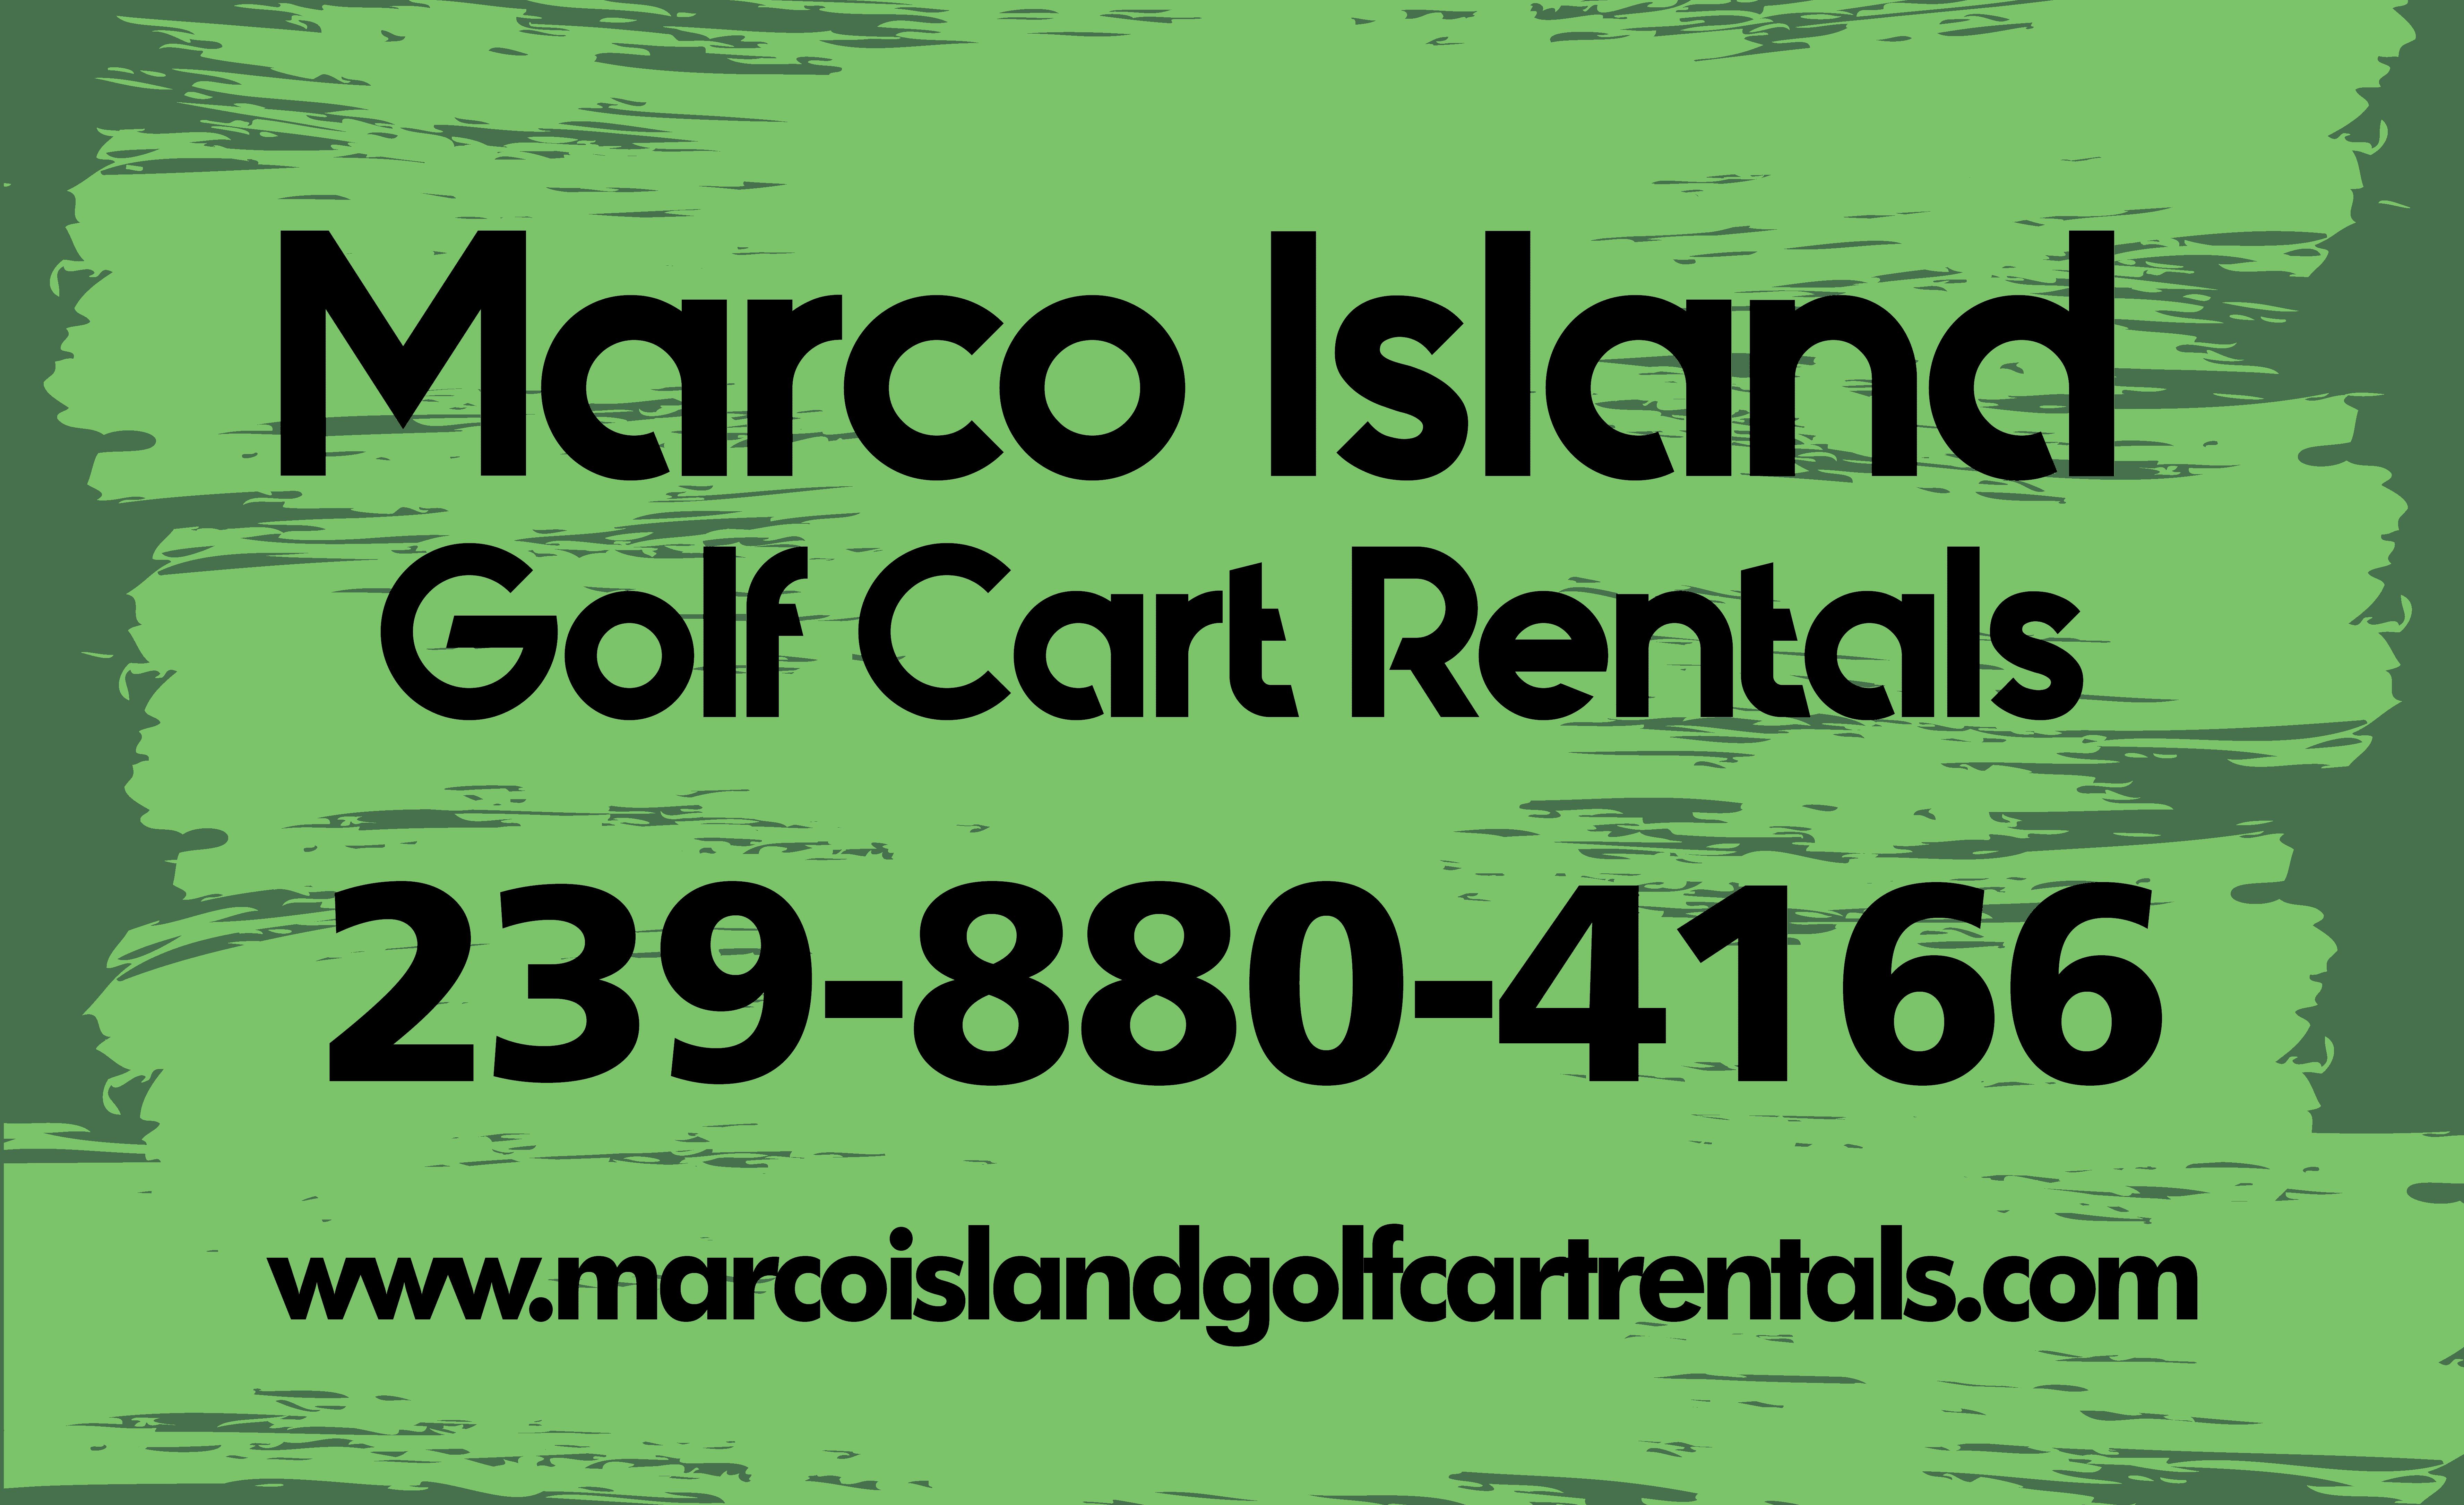 Marco Island Golf Cart Rentals